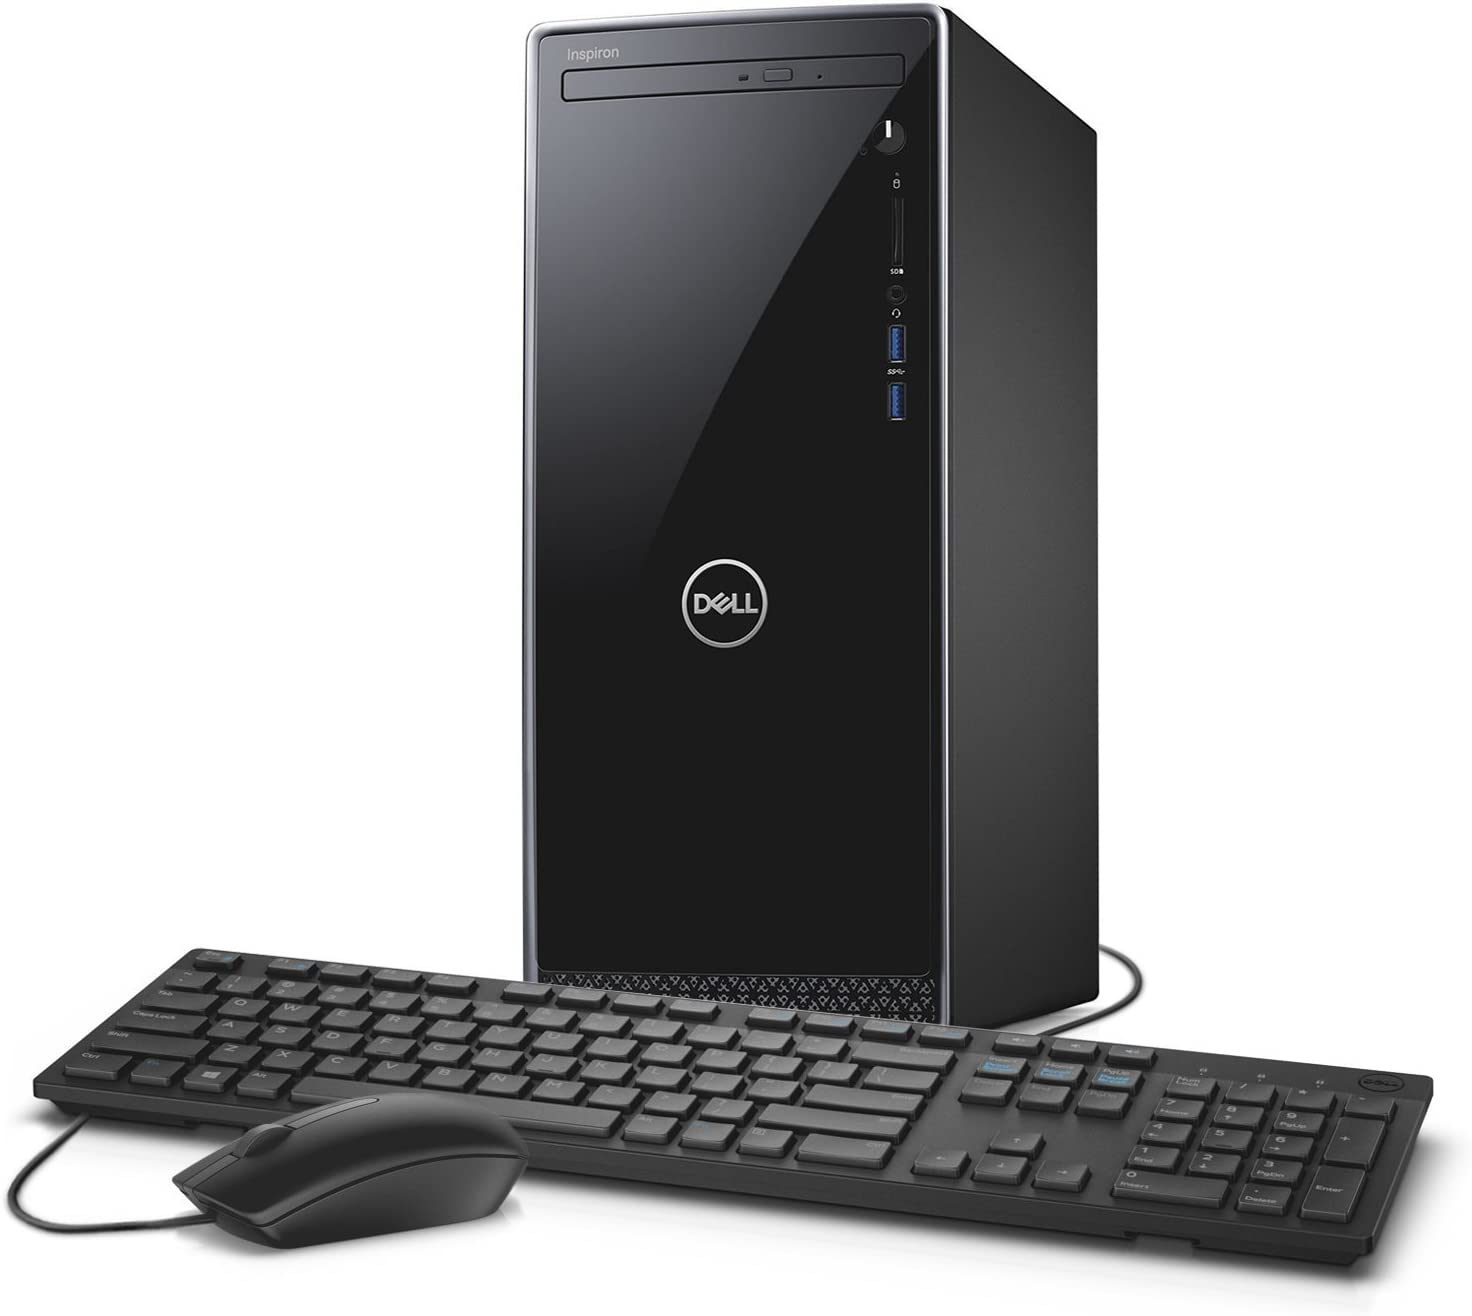 Dell Inspiron i3670 Desktop - 8th Gen Intel Core i7-8700 6-Core up to 4.70 GHz, 16GB DDR4 Memory, 2TB High Speed SATA HD (7200RPM), 2GB Nvidia GeForce GT 1030, DVD Burner, Windows 10 Pro